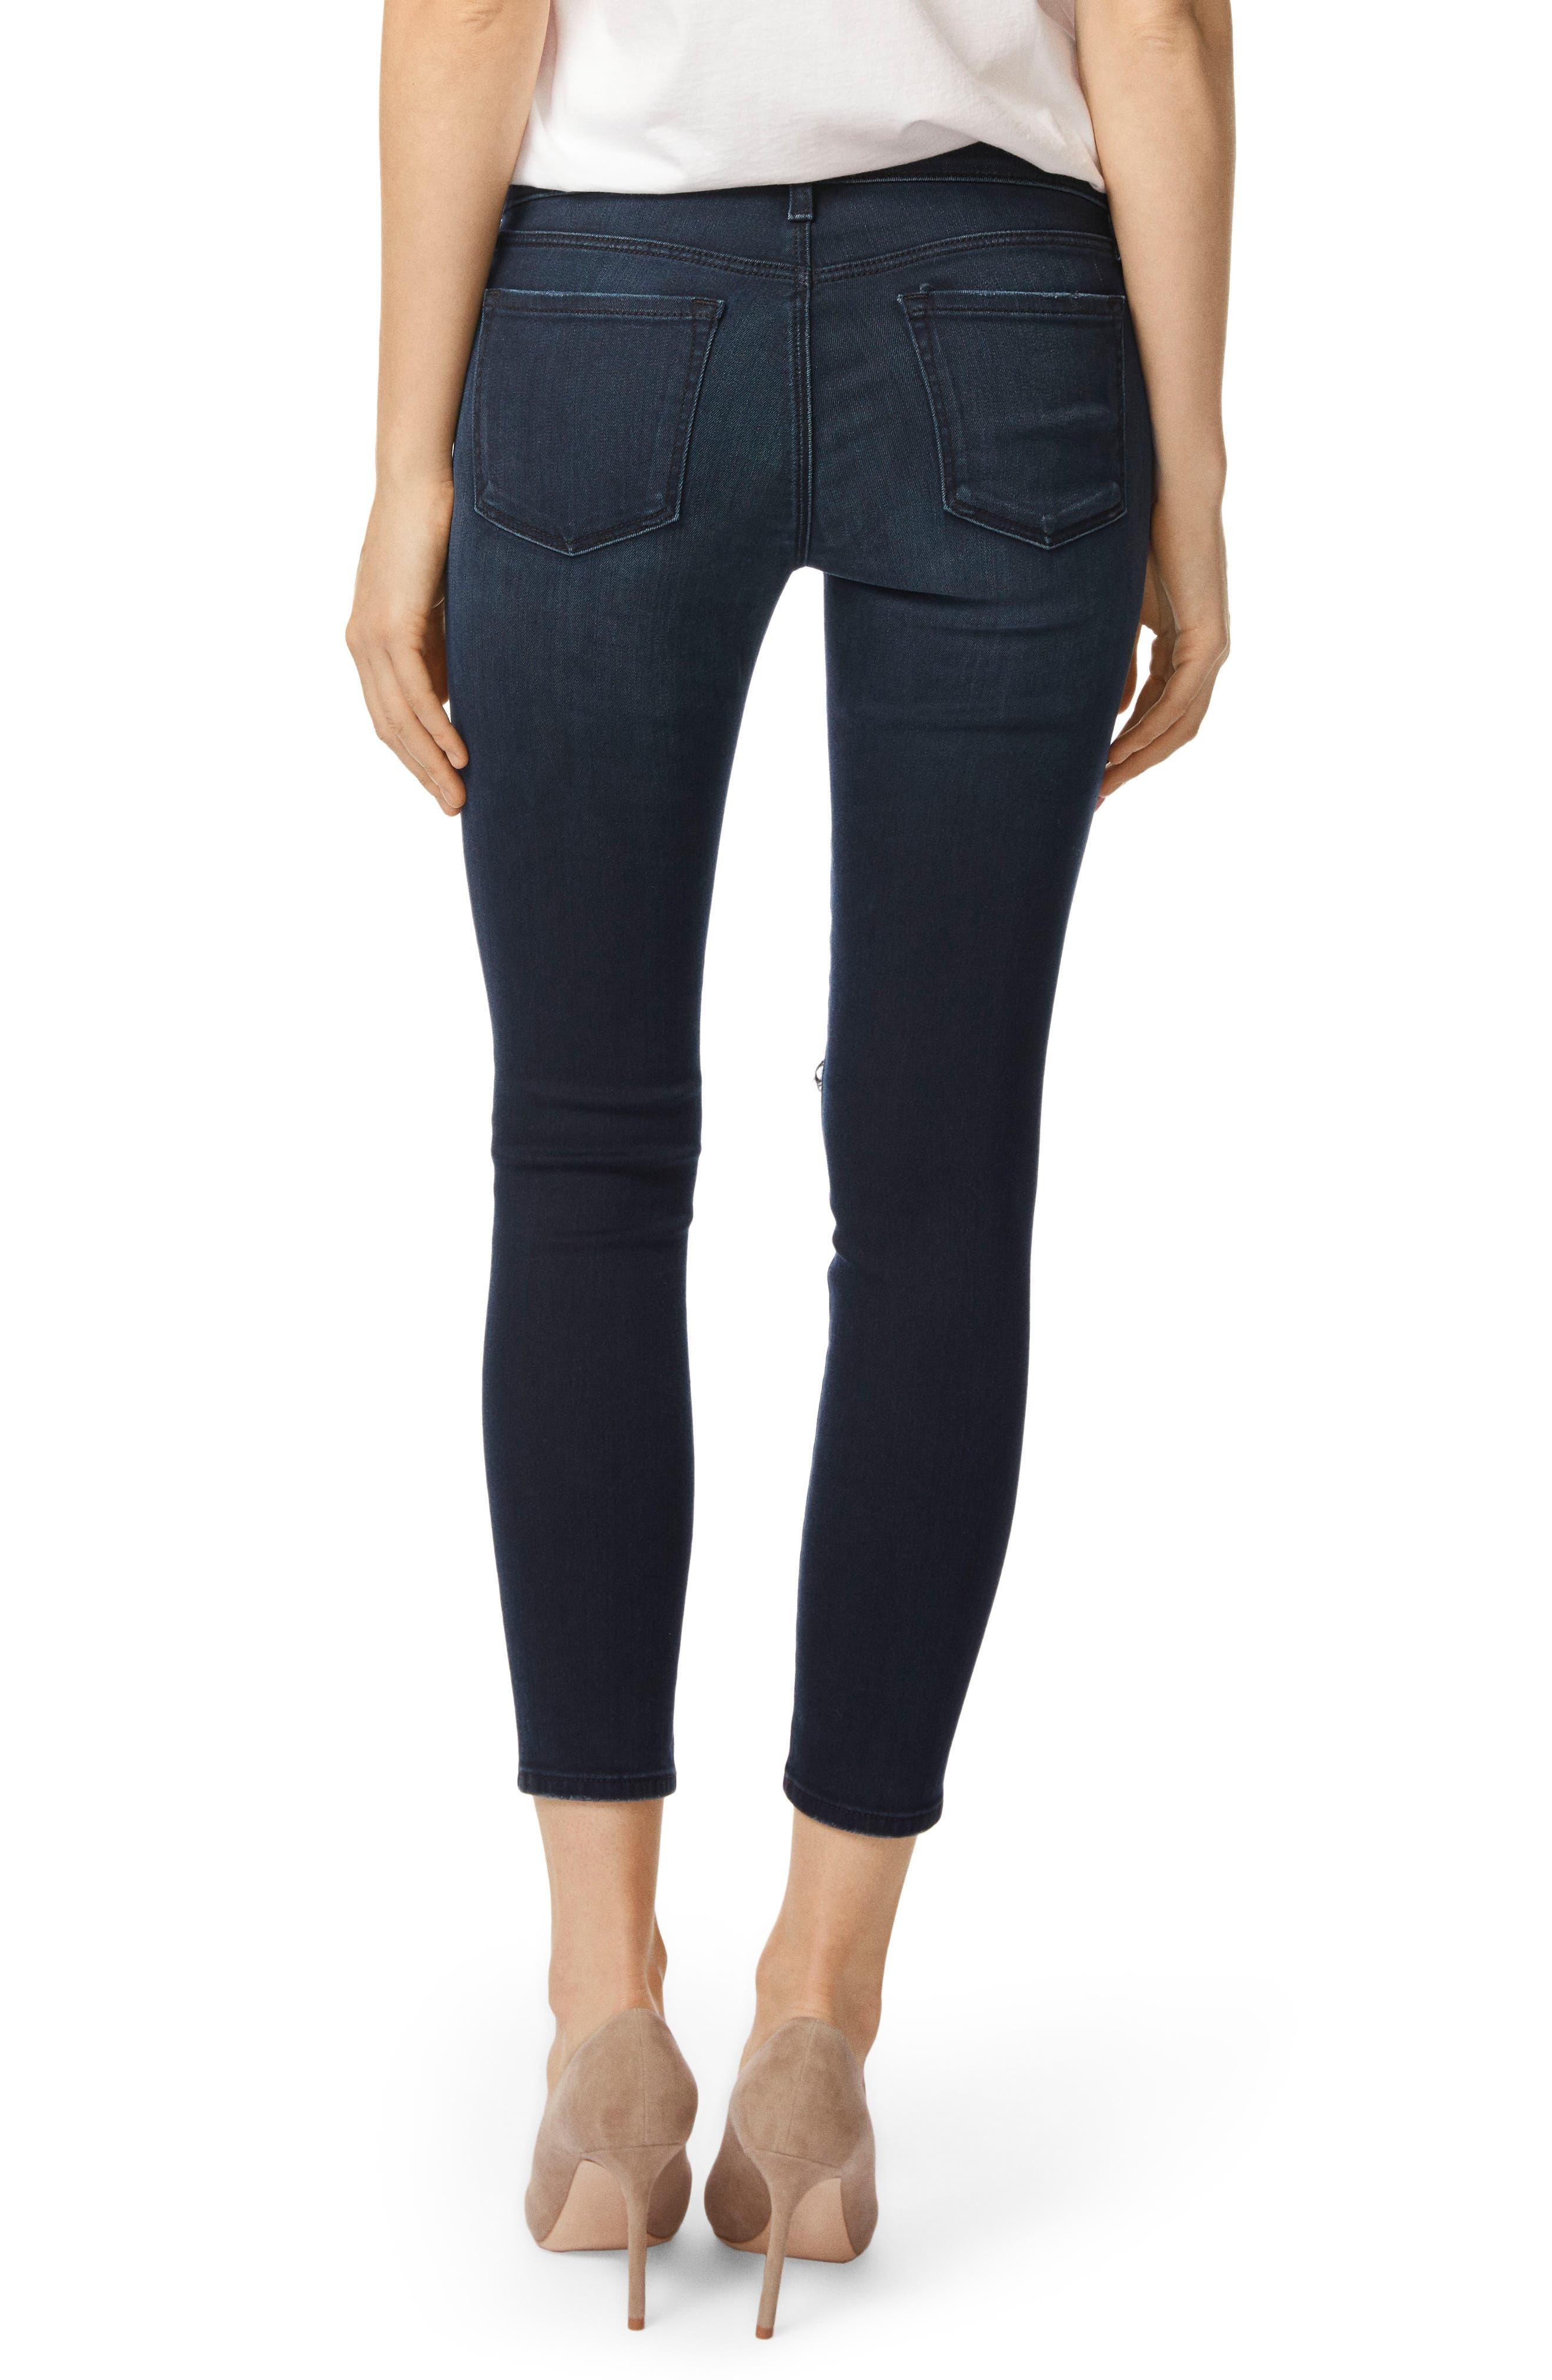 9326 Low Rise Crop Skinny Jeans,                             Alternate thumbnail 2, color,                             Black Sea